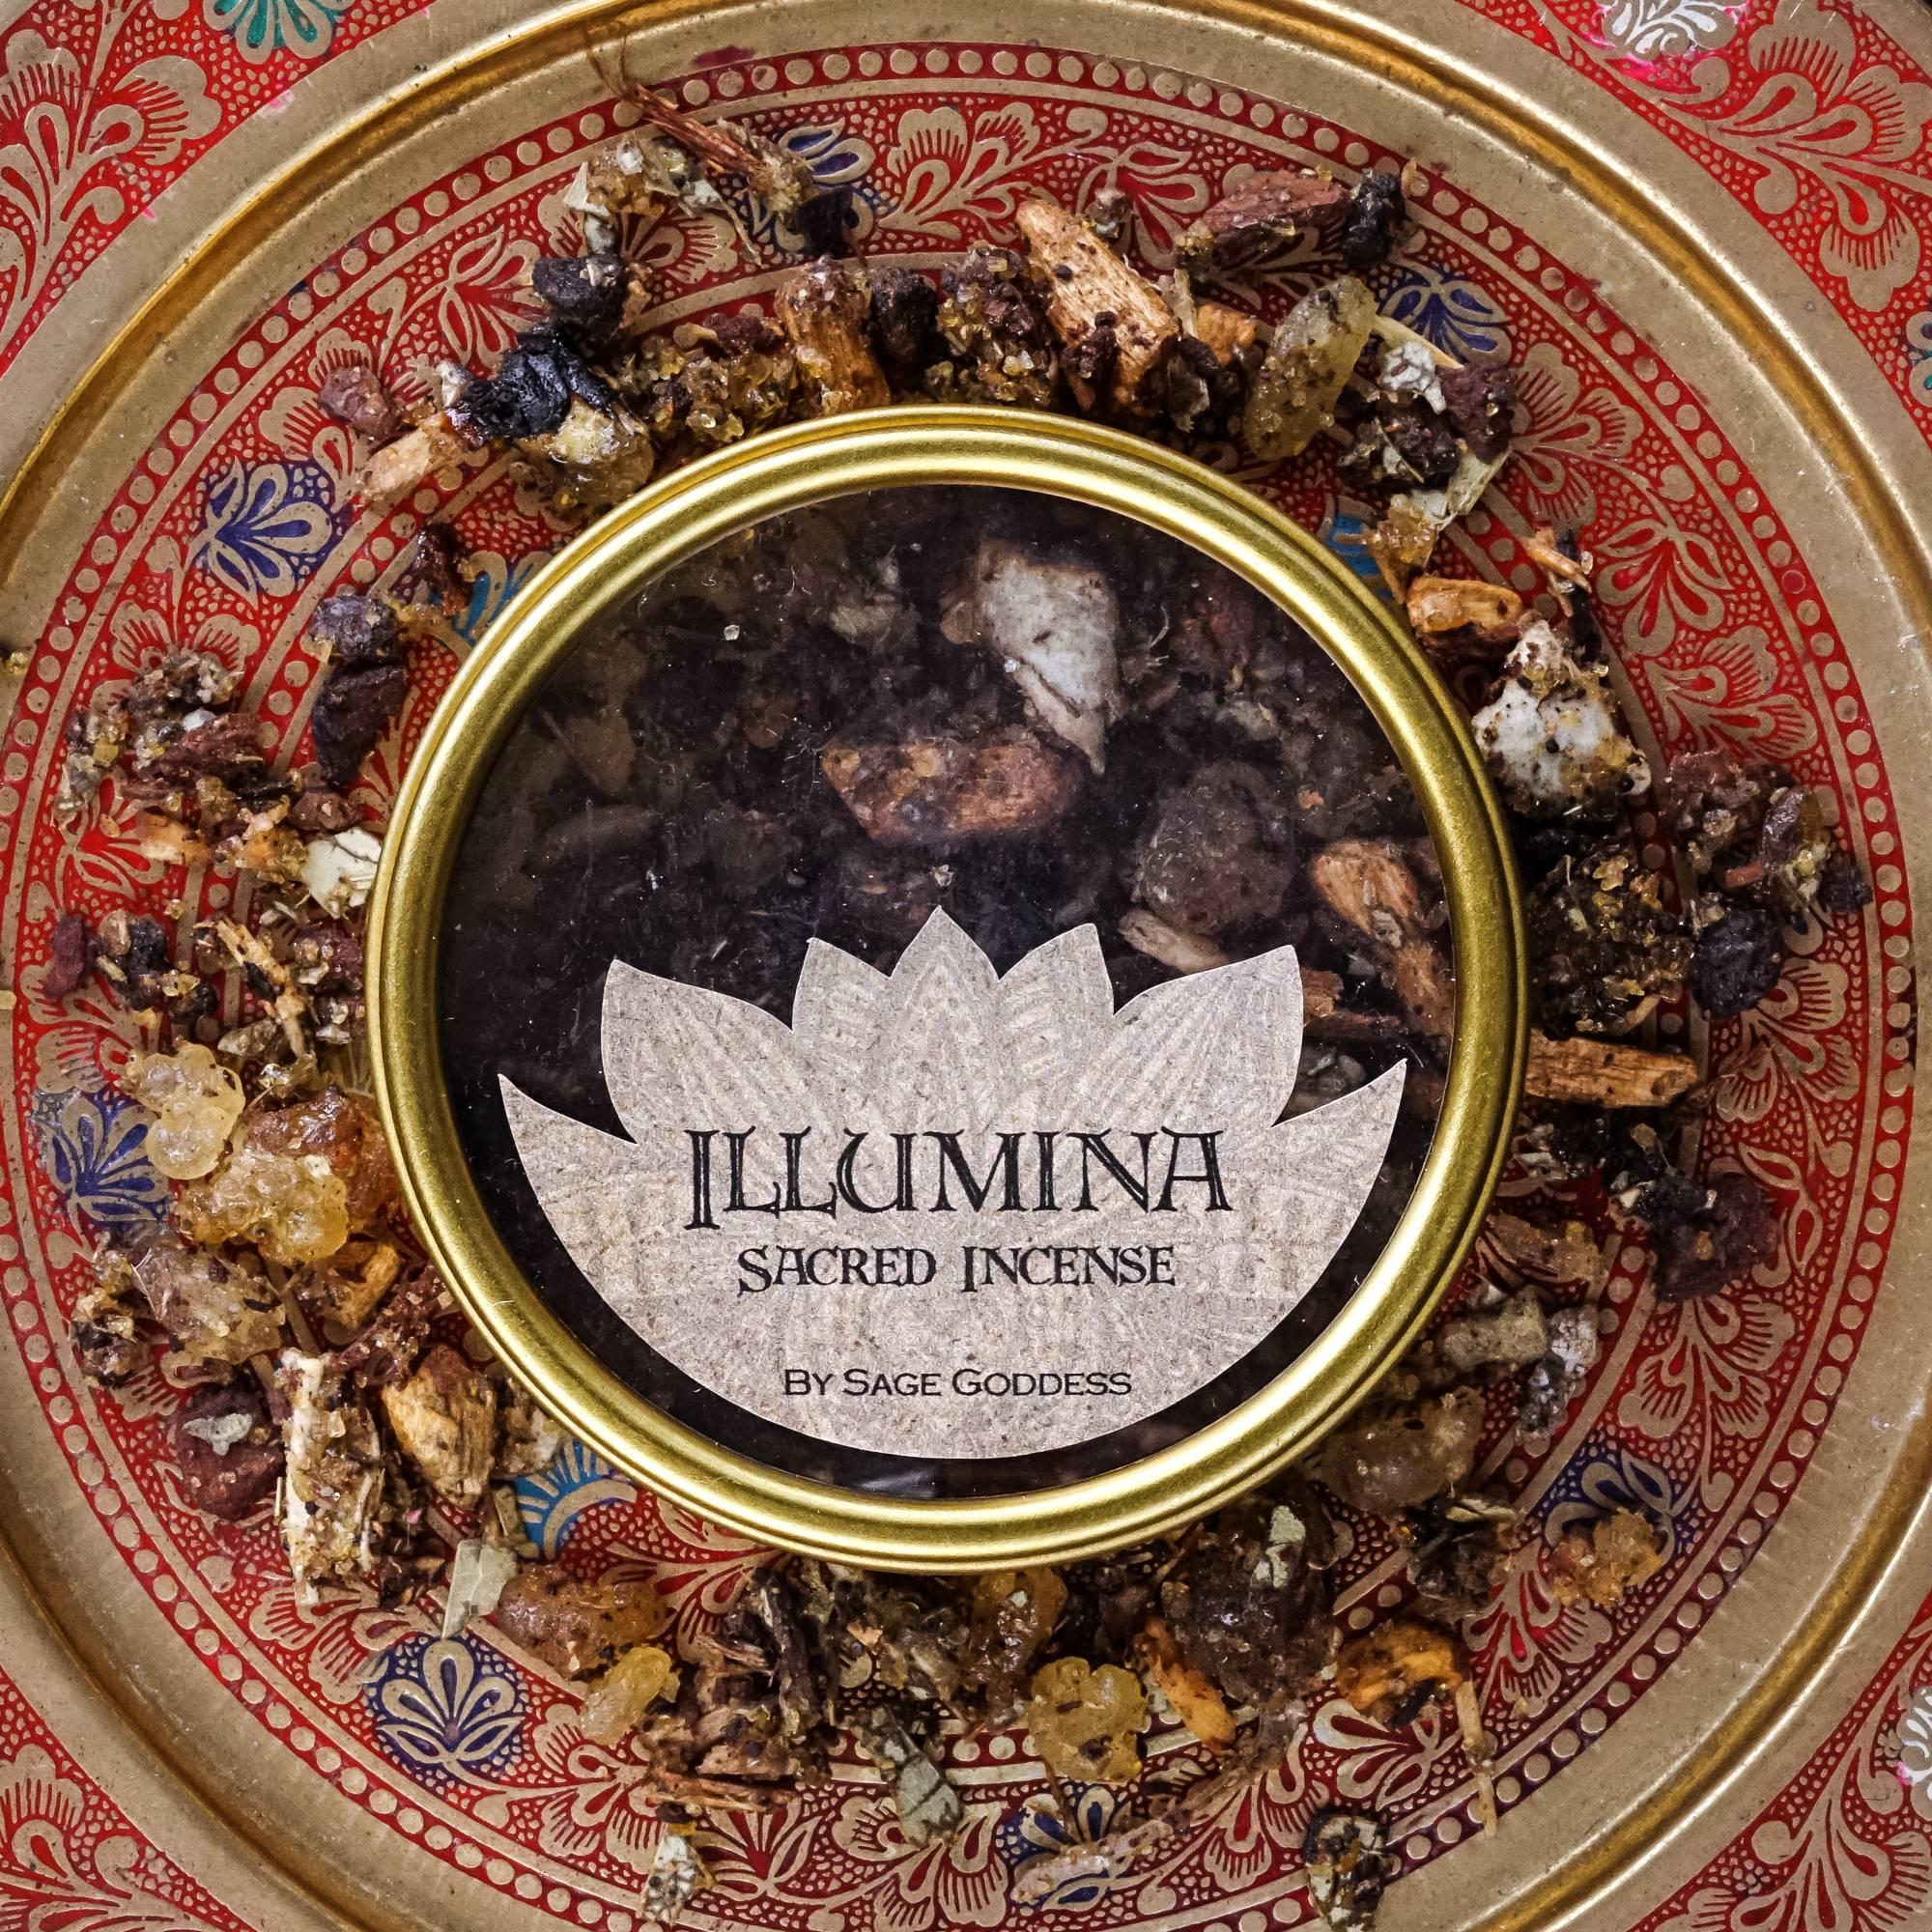 Illumina Sacred Incense